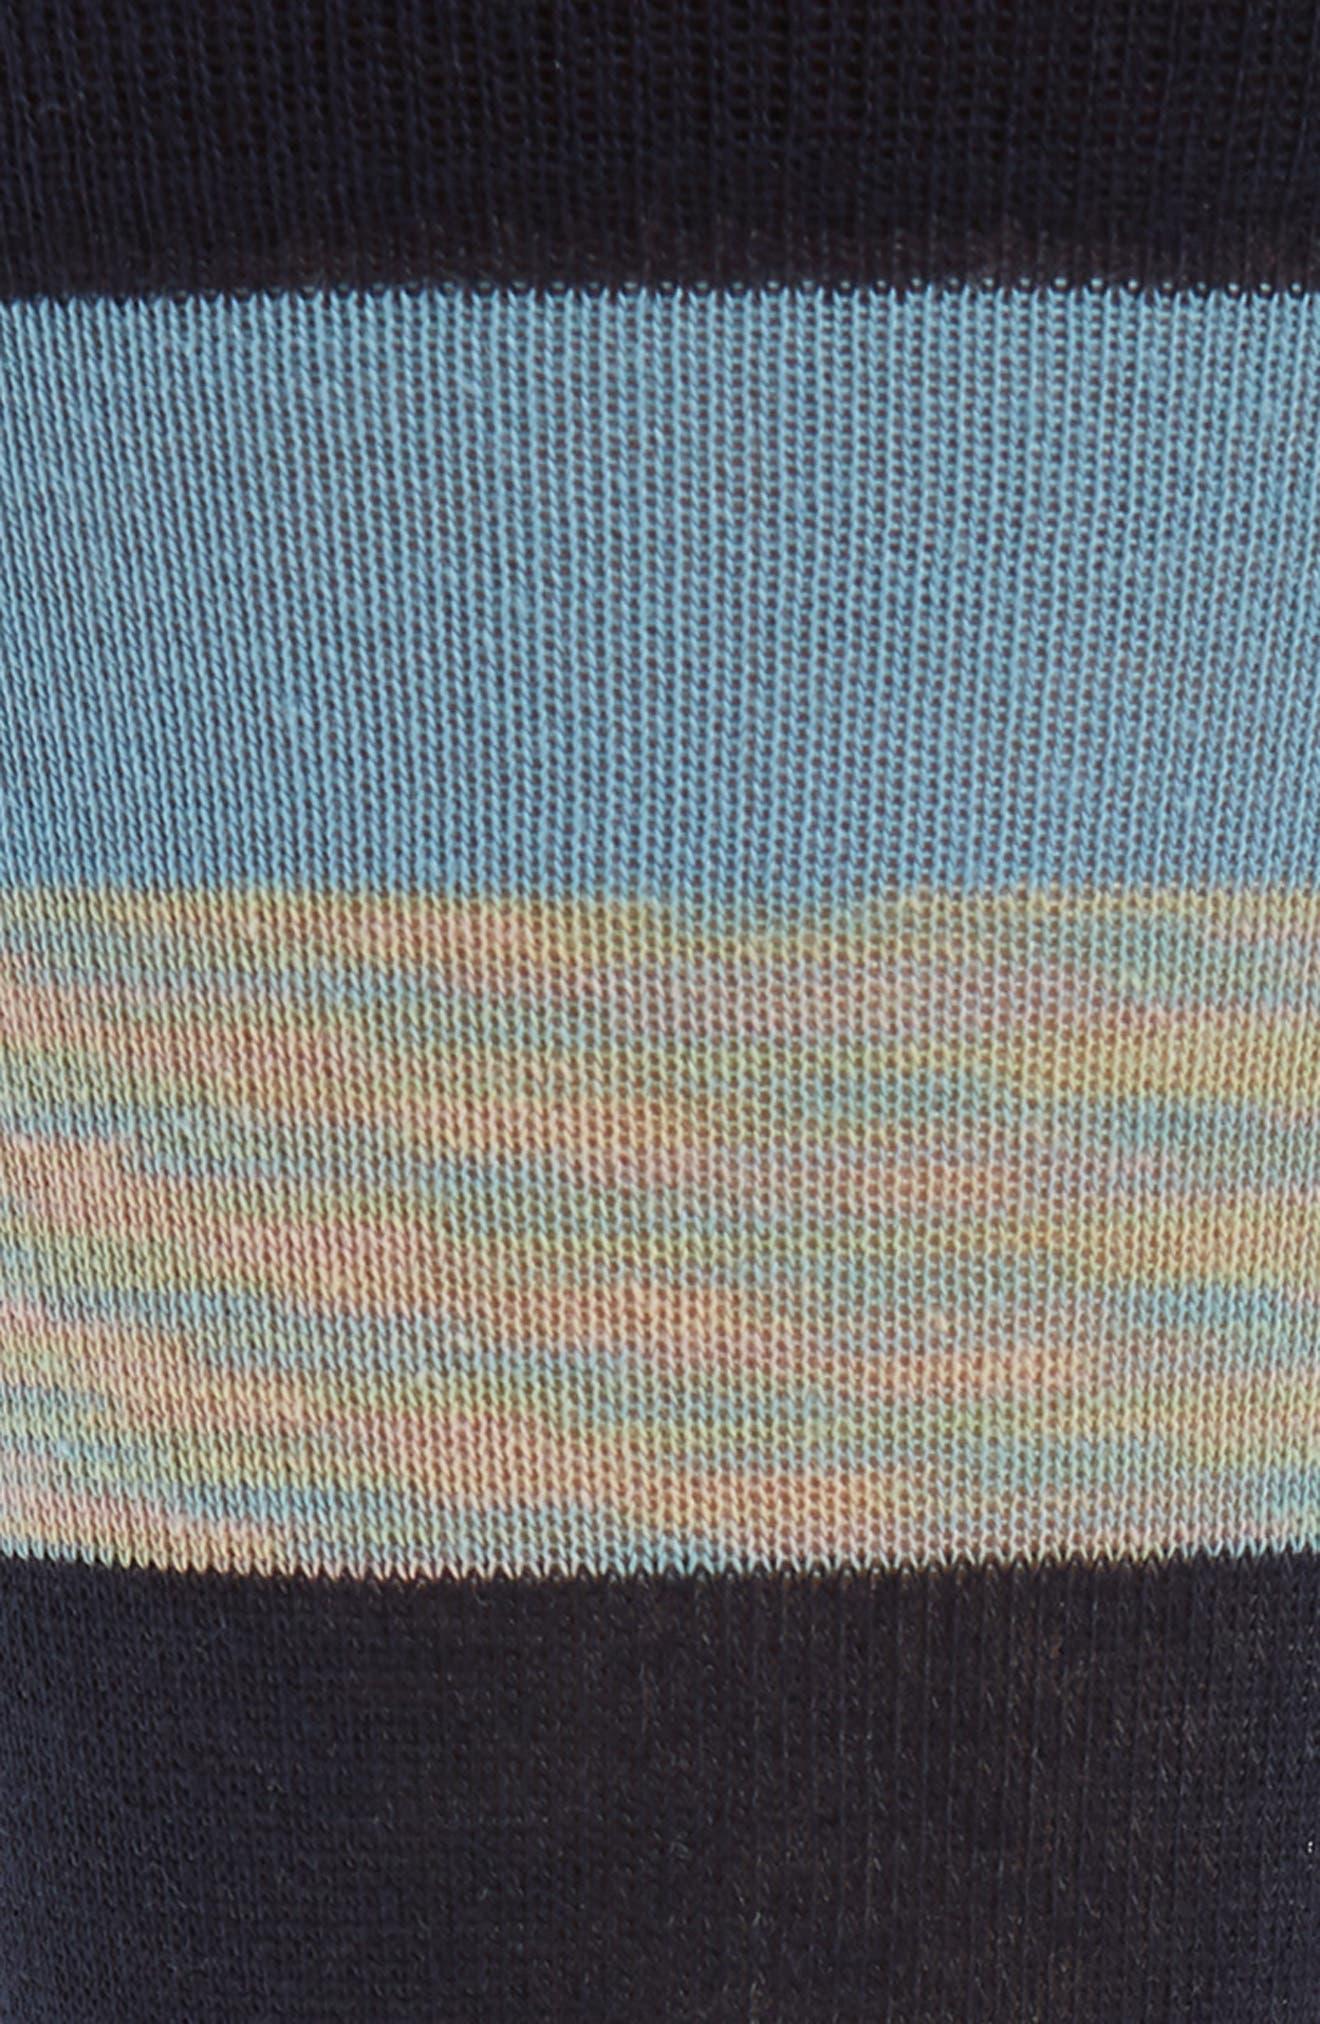 Rugby Stripe Socks,                             Alternate thumbnail 2, color,                             450